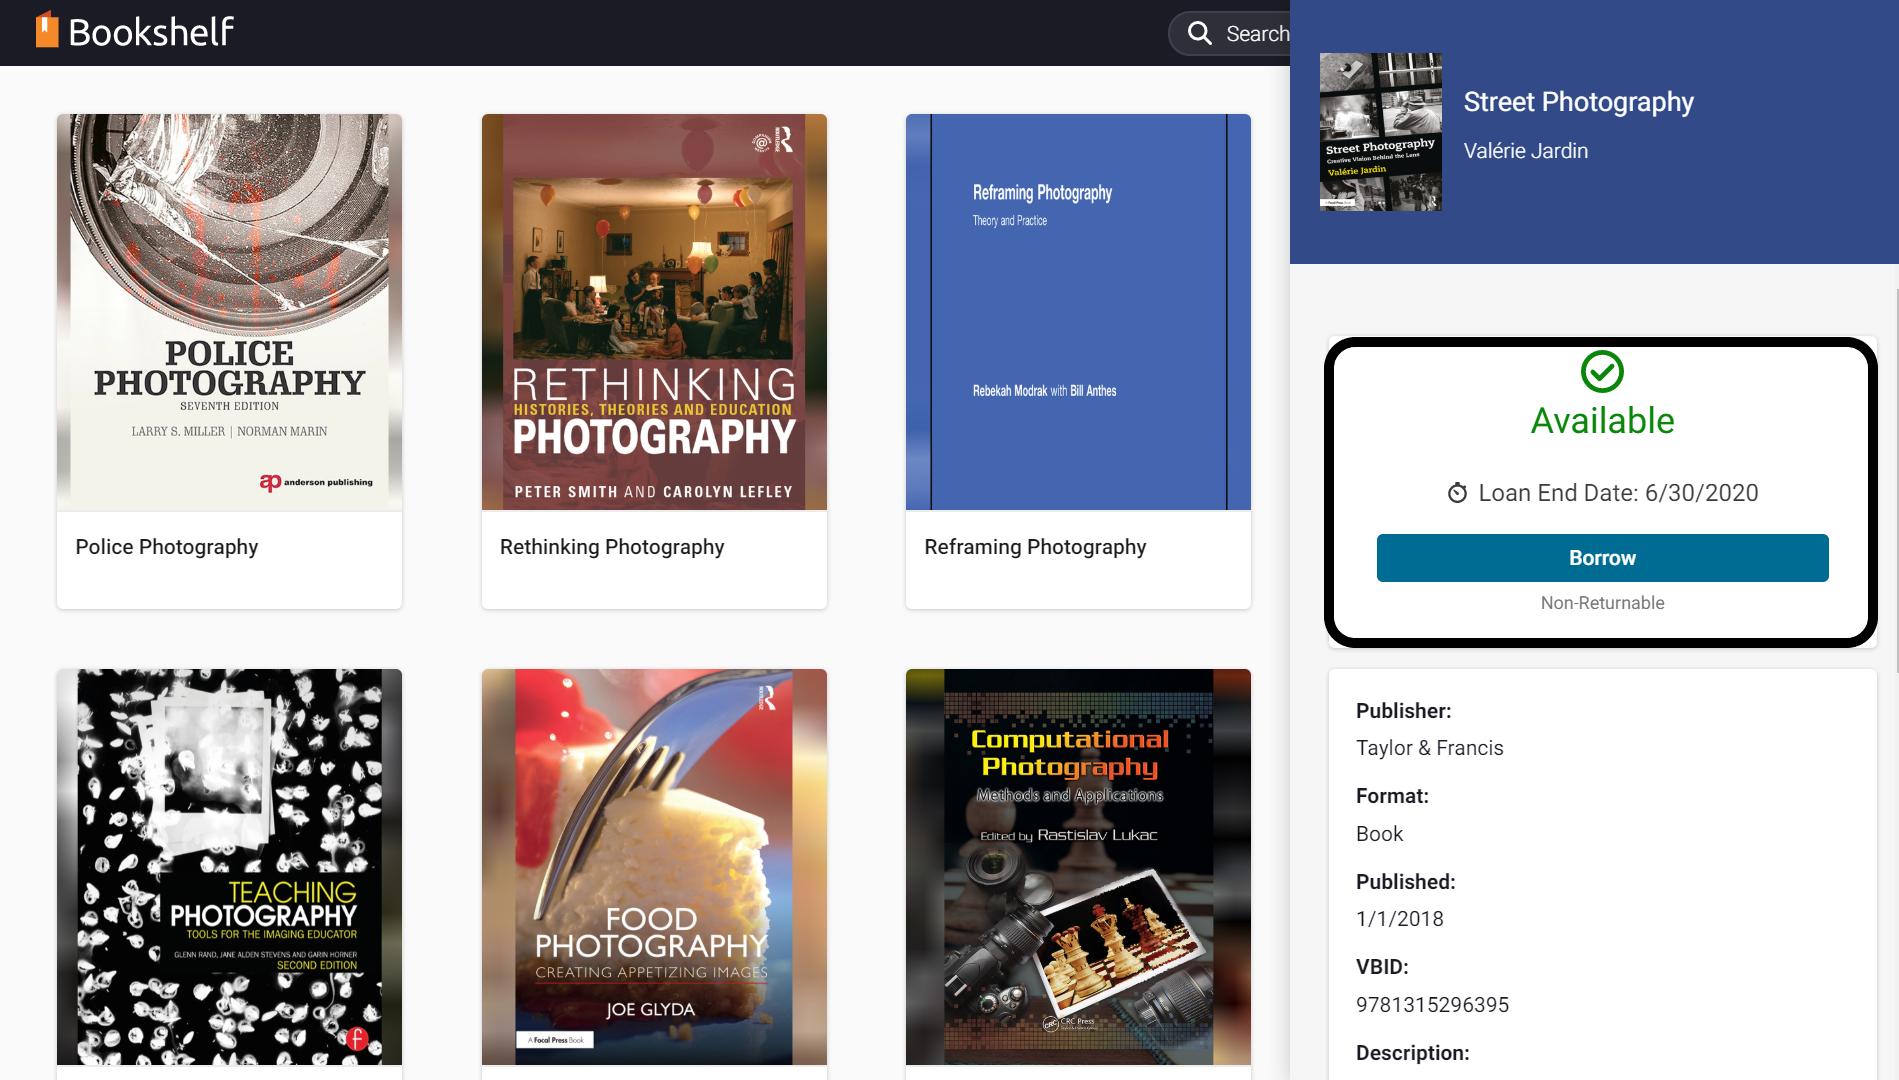 Borrow an eBook to add it your personal bookshelf